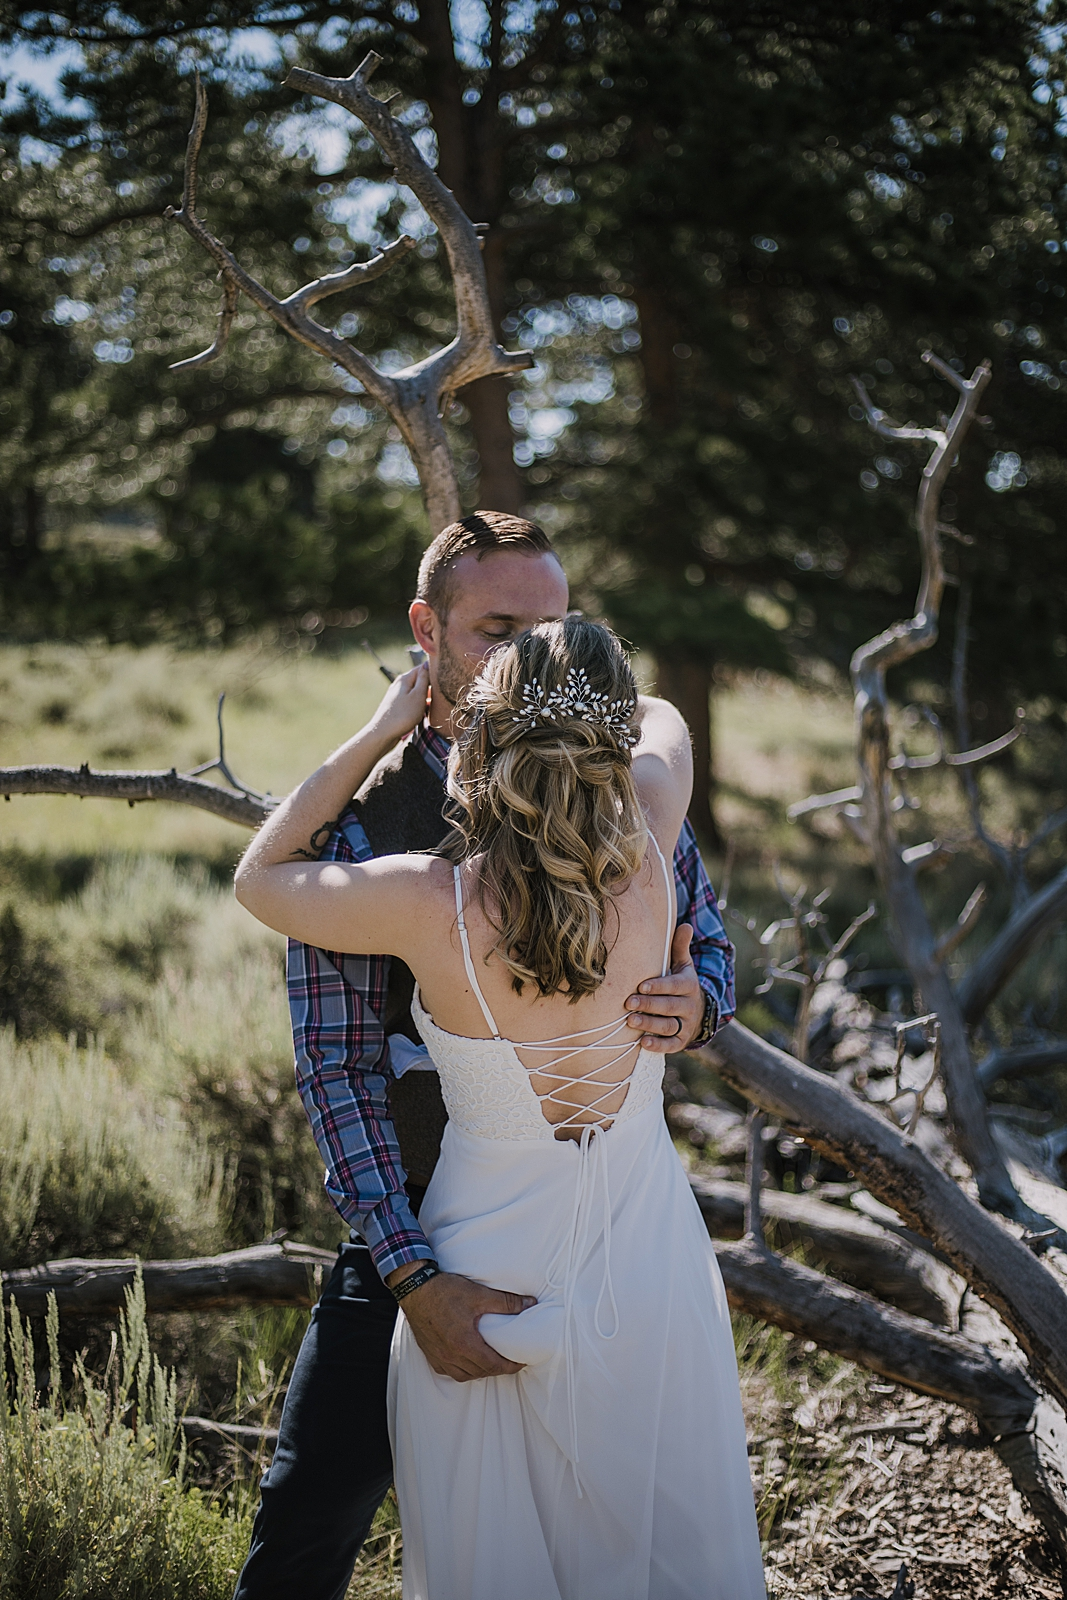 groom butt grab, RMNP elopement ceremony, rocky mountain national park elopement, 3M curves elopement, self solemnizing, self solemnization, long's peak, summer hiking elopement, estes park elopement